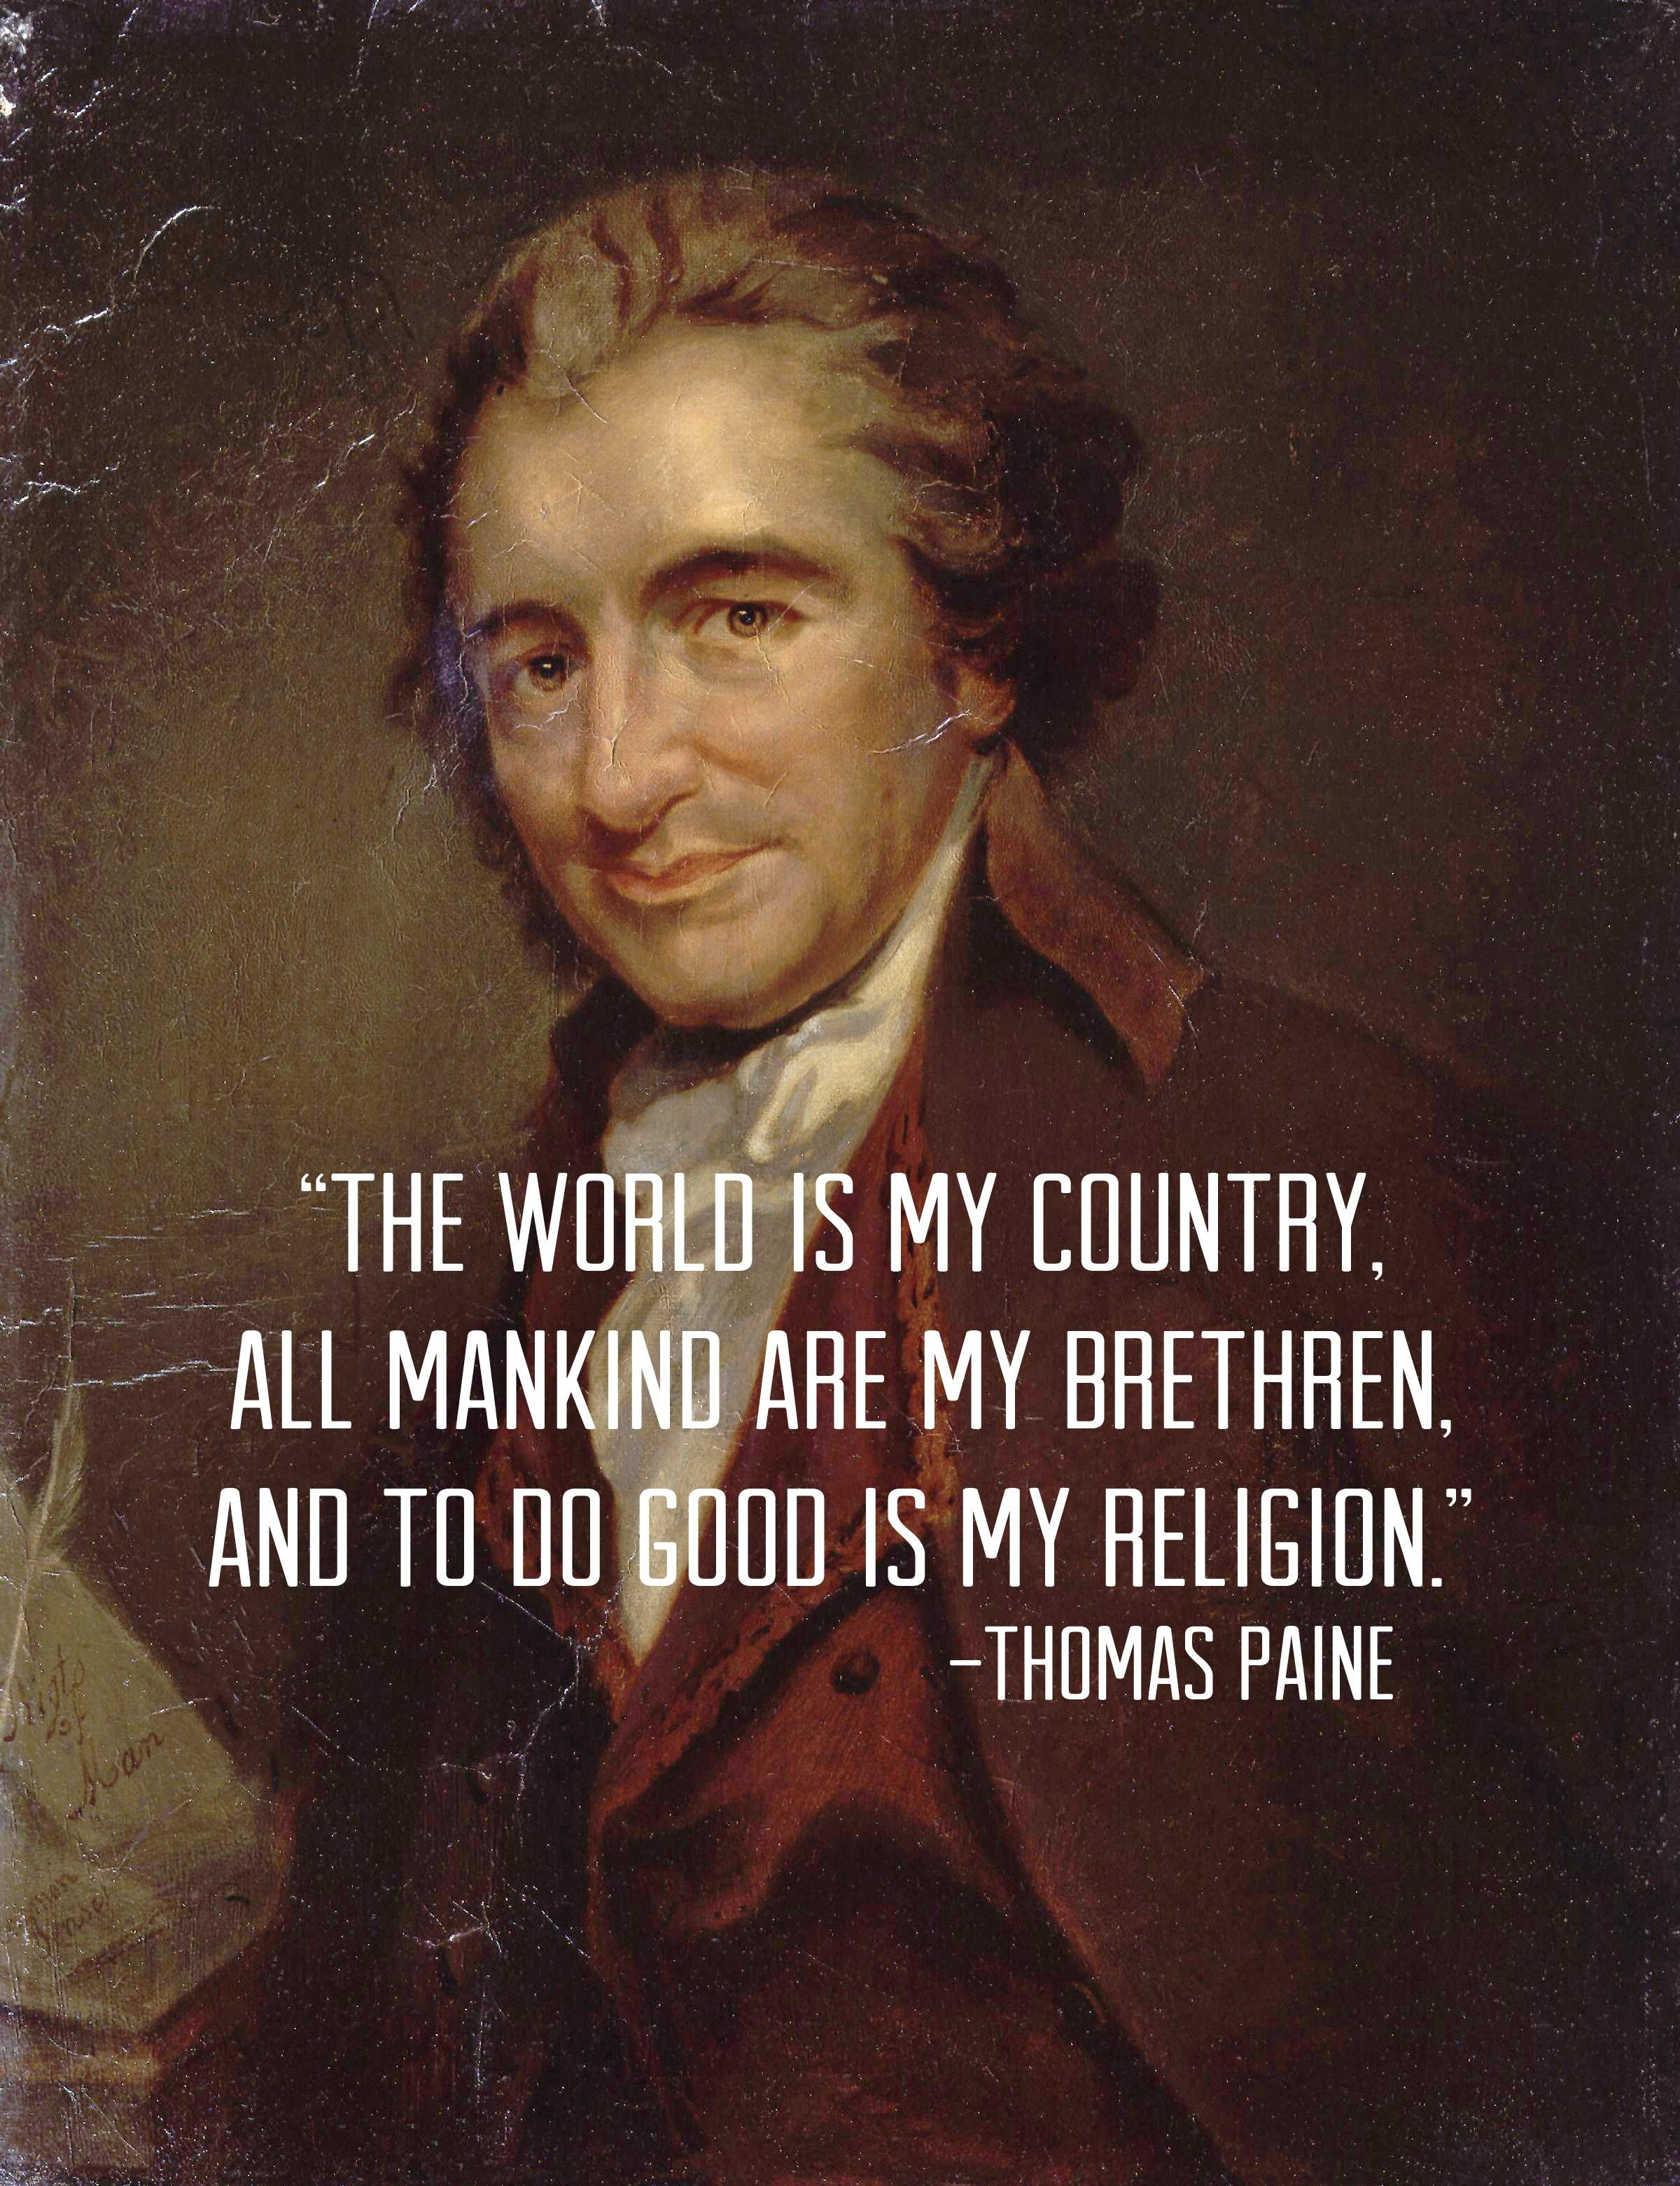 thomas paine citater Thomas Paine | History | Thomas paine, Thomas paine quotes, Quotes thomas paine citater